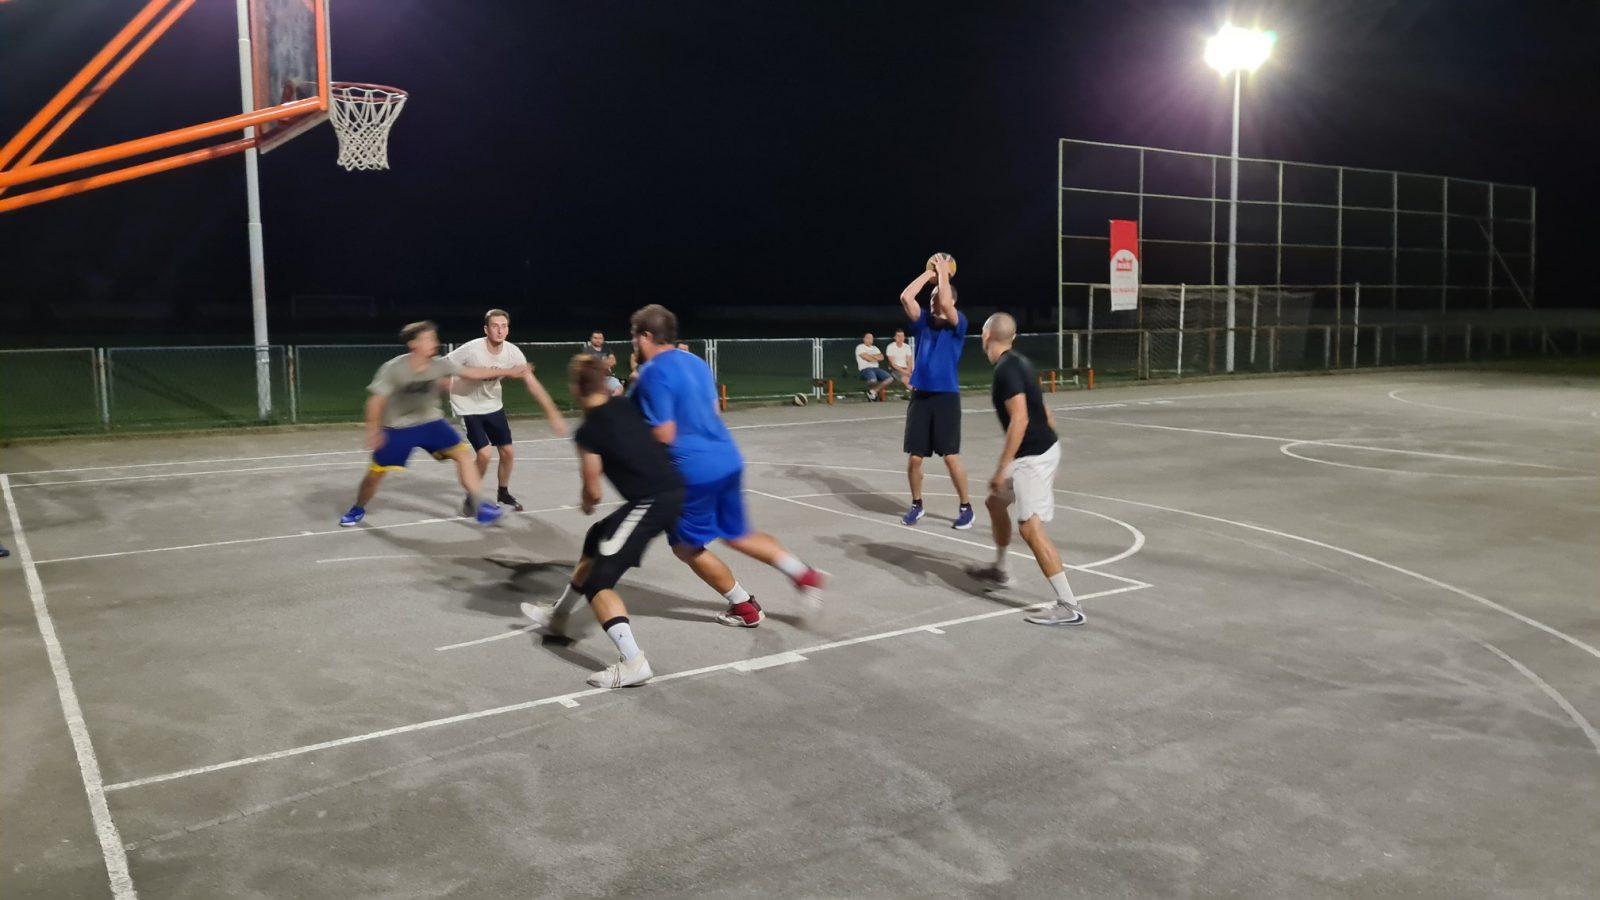 1. prvenstvo Međimurja u streetball-u 16